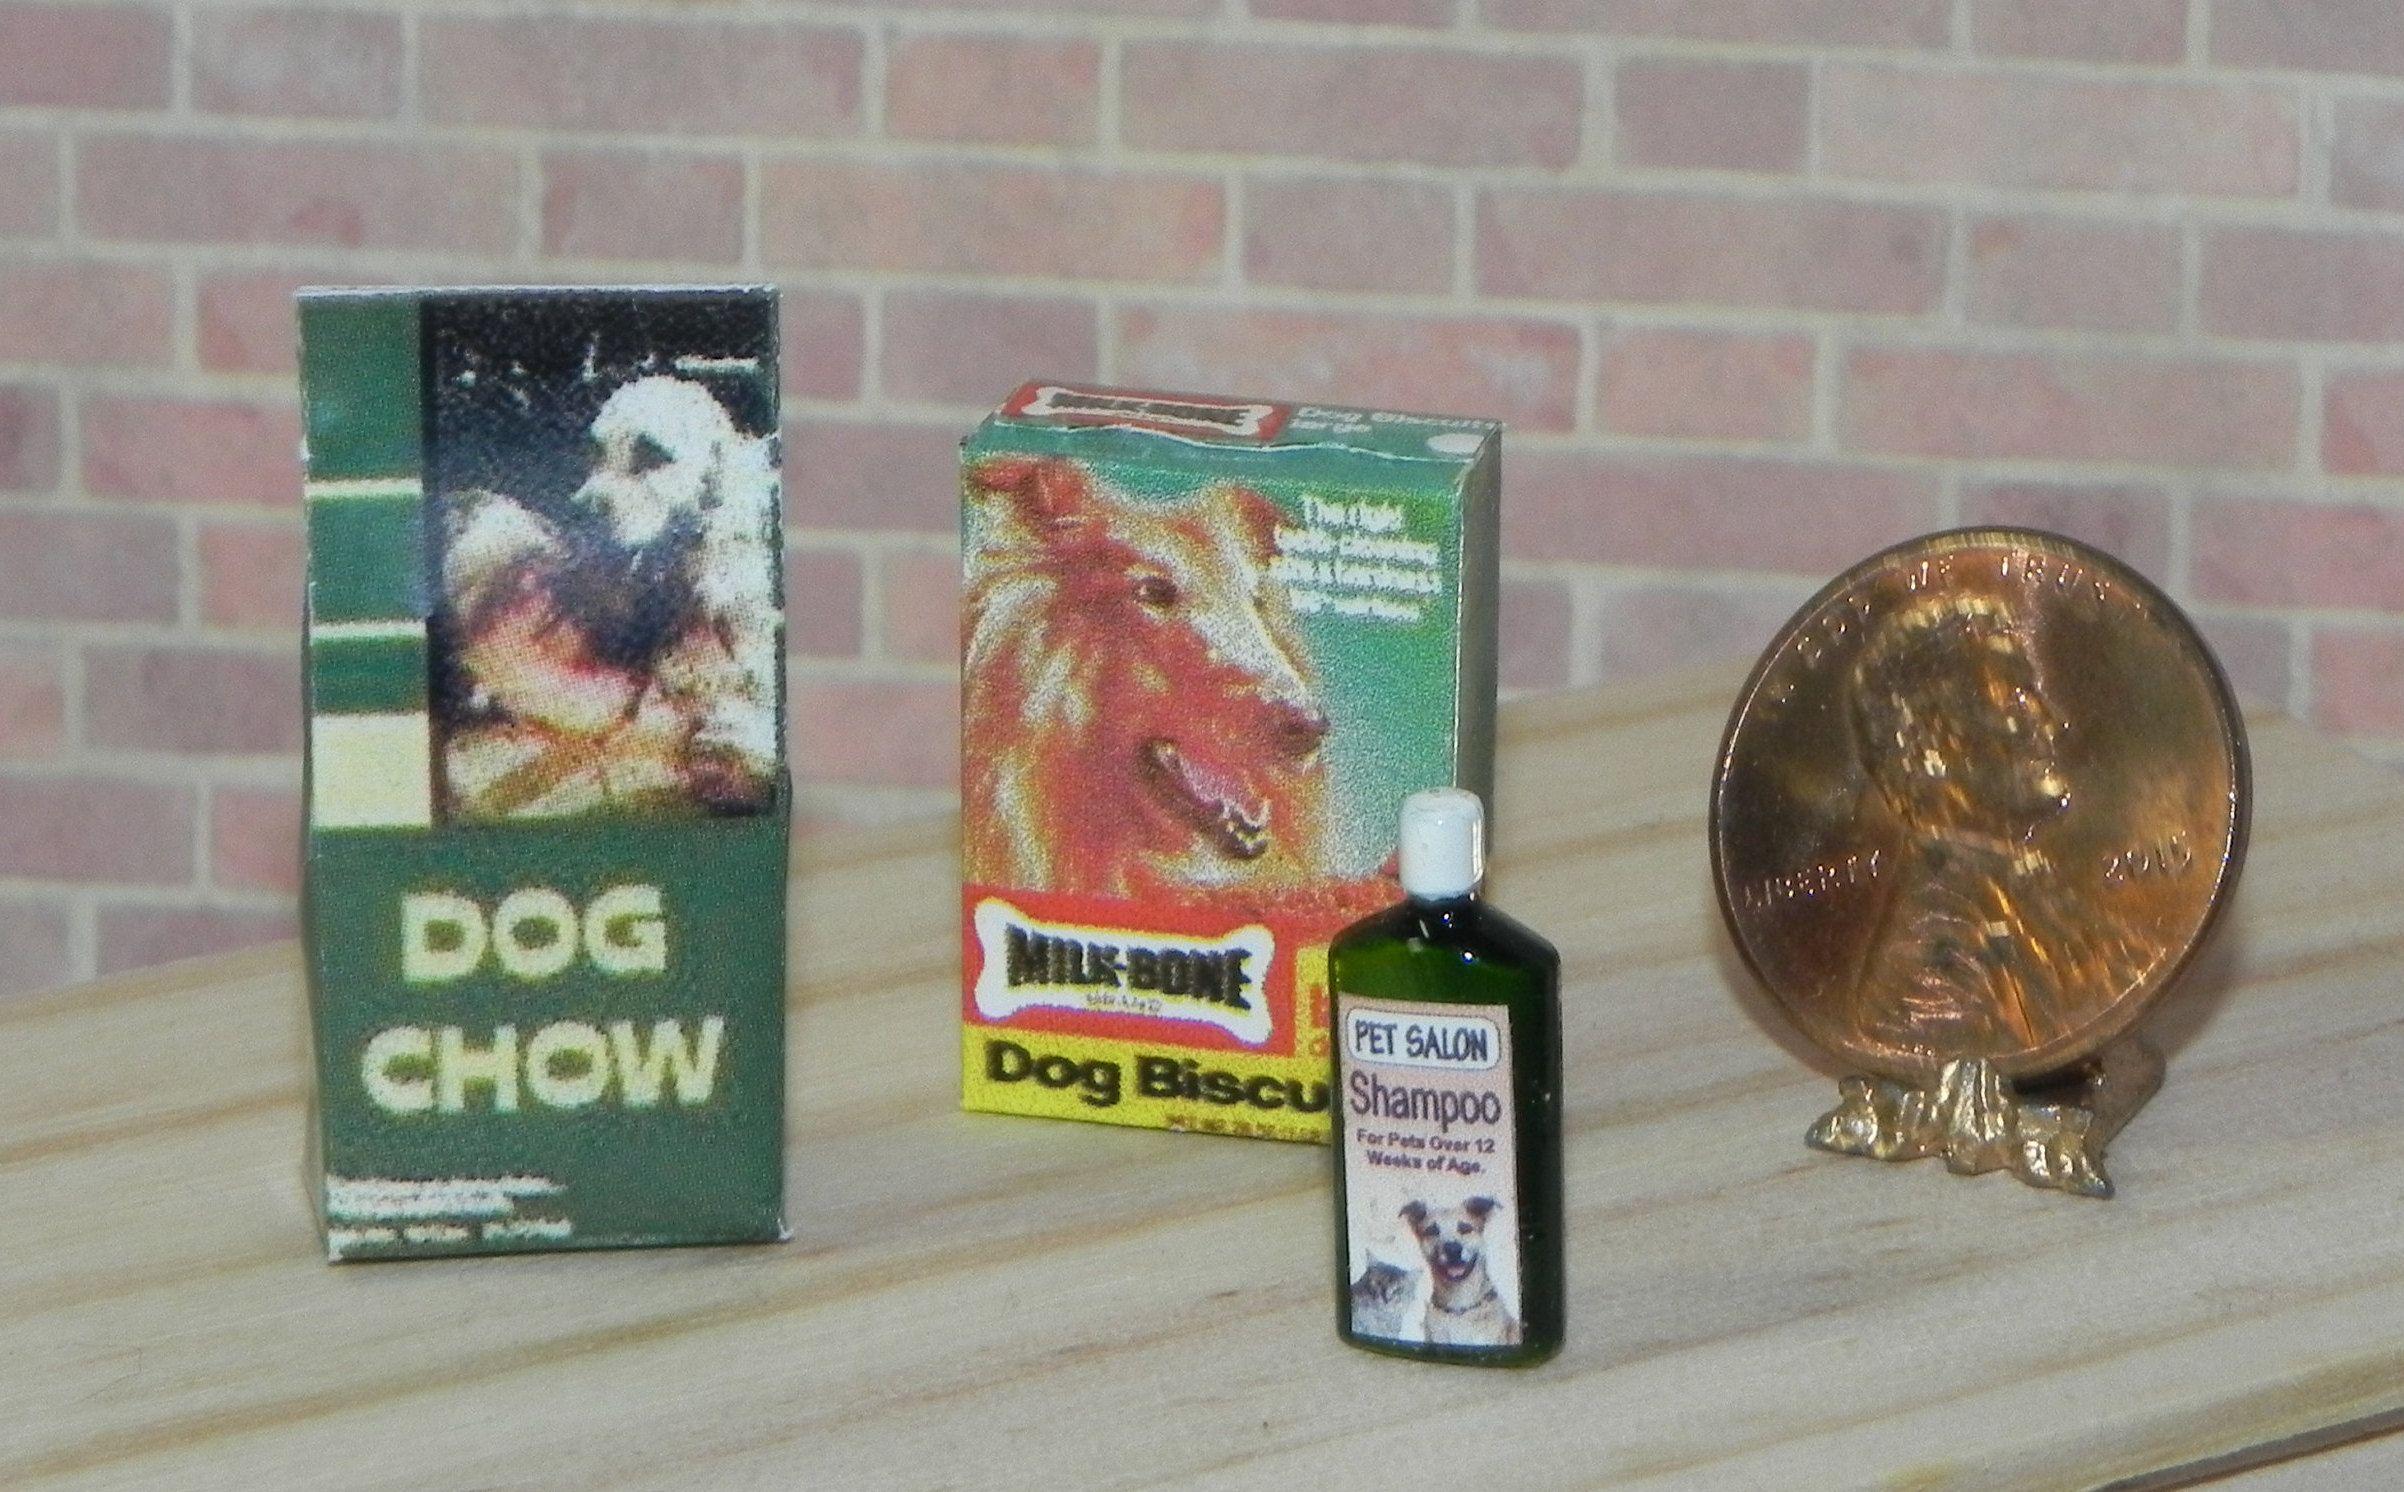 Dollhouse Miniature Dog Food Dog Biscuits And Shampoo Set 1 12 Scale